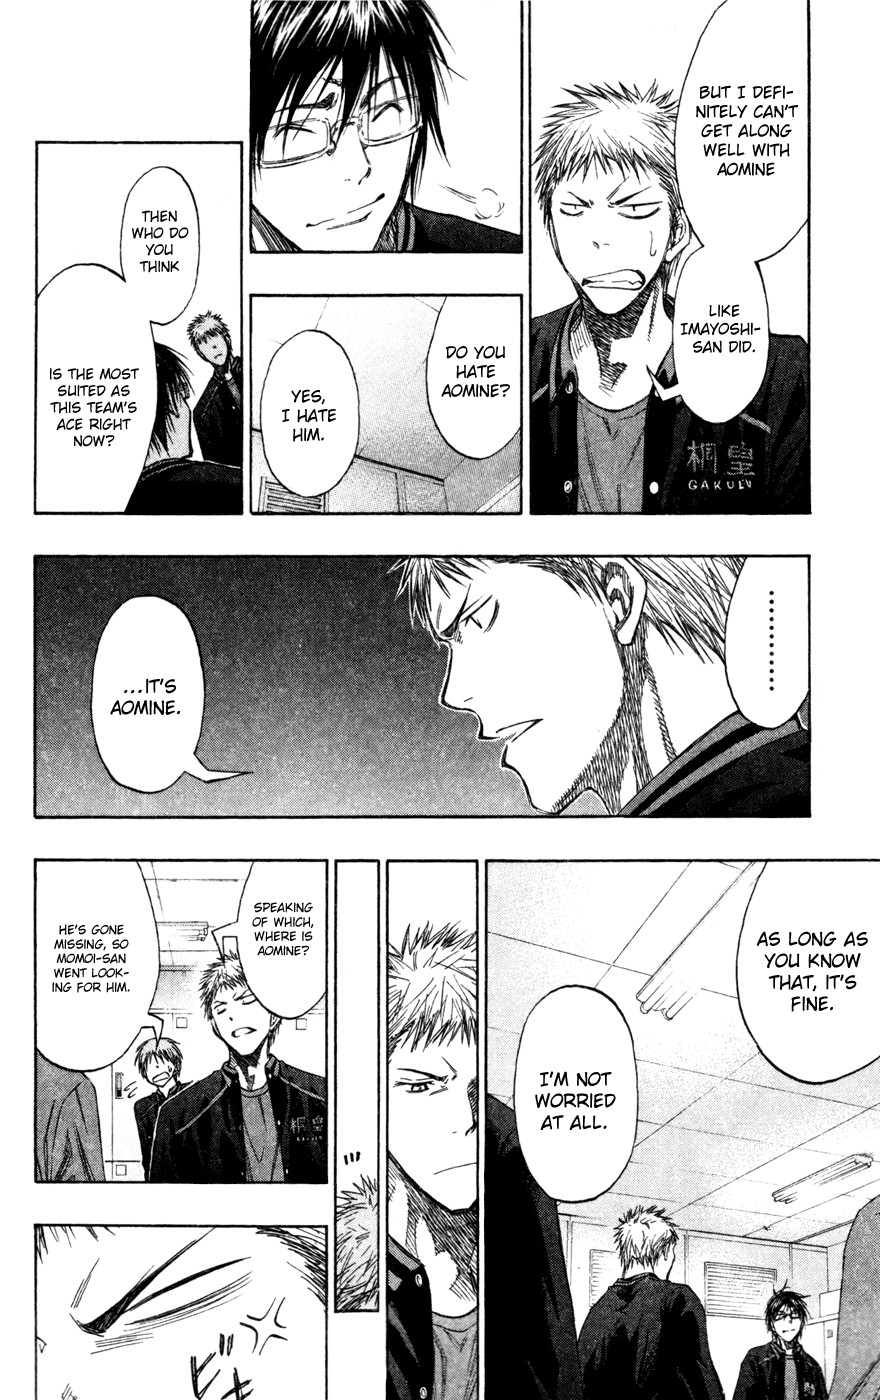 Kuroko no Basket Manga Chapter 139 - Image 18